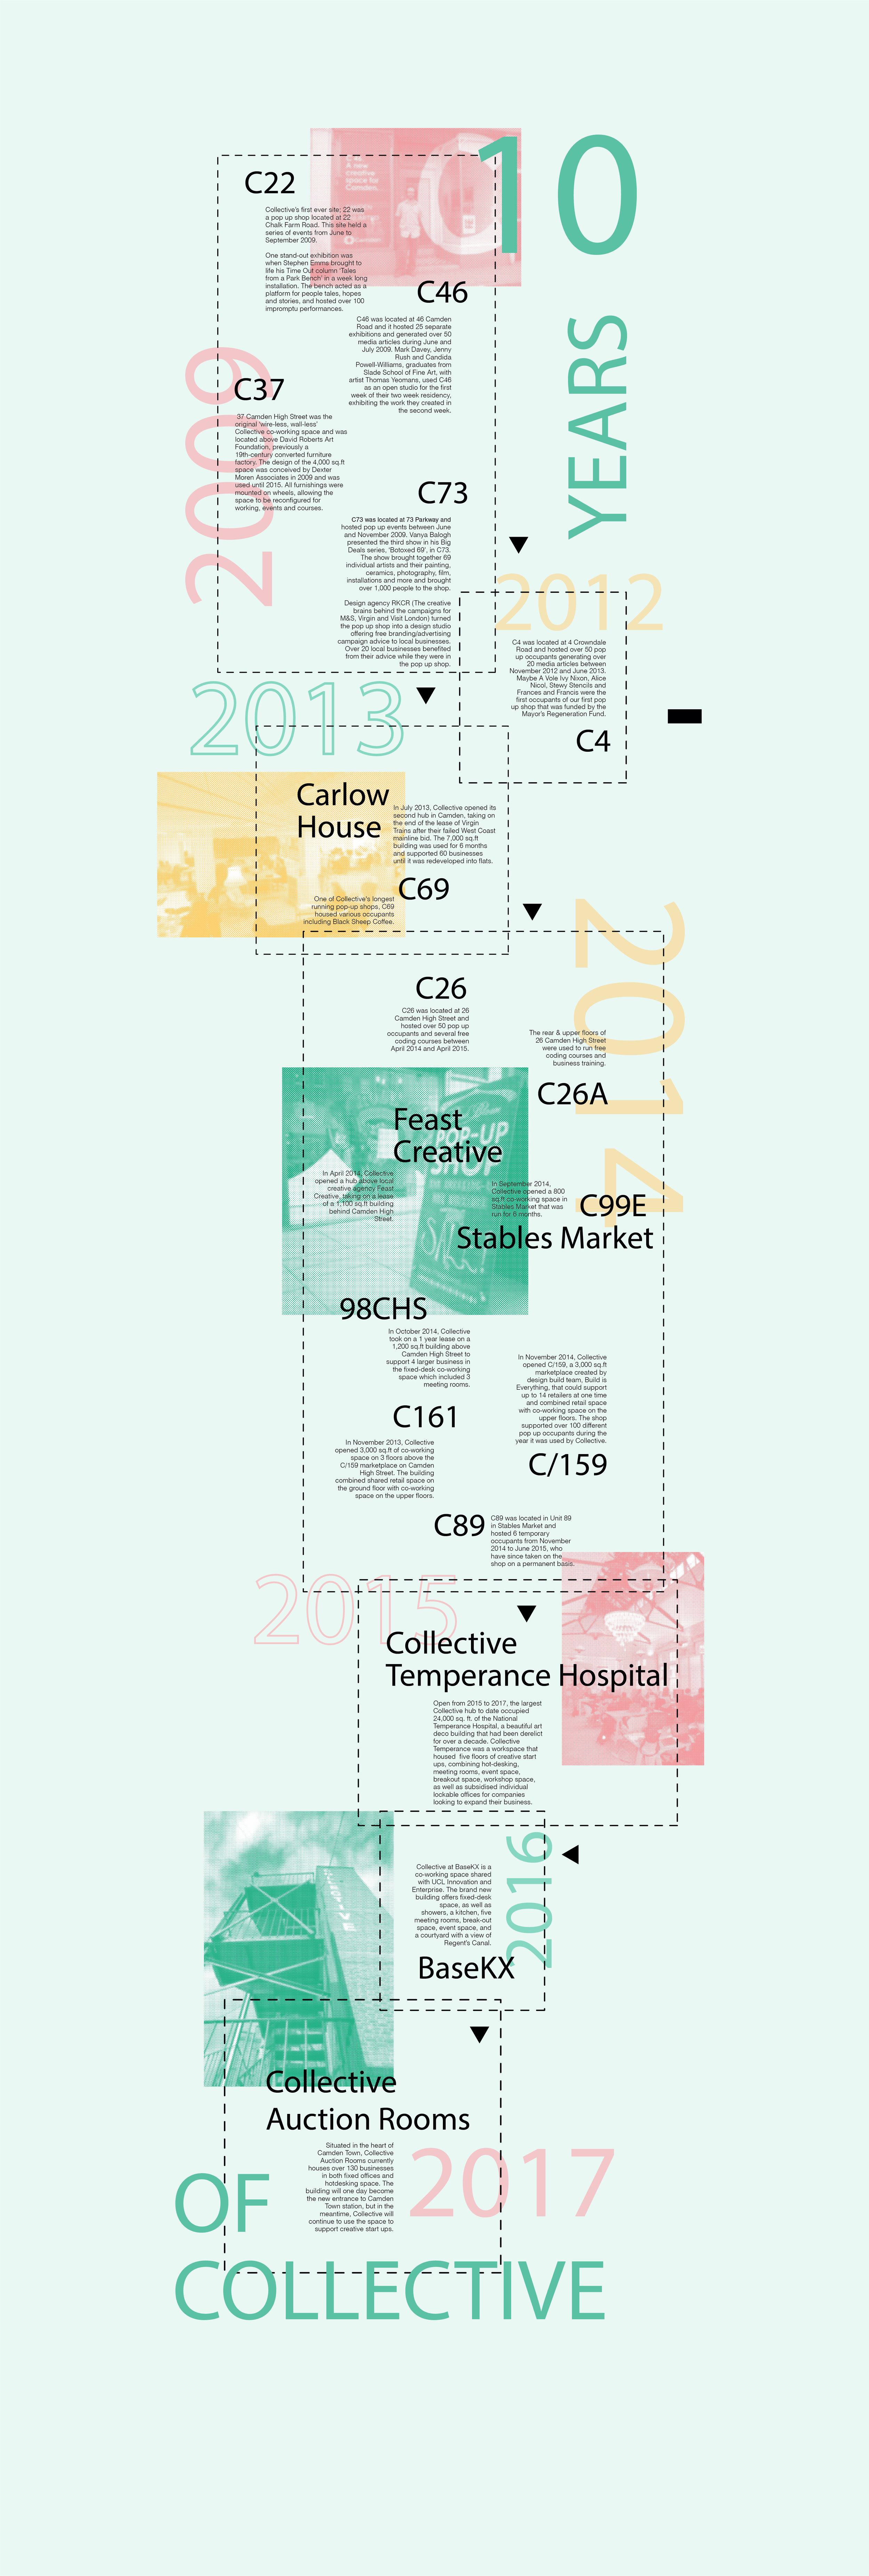 CamdenCollective_infographic_webformat.jpg